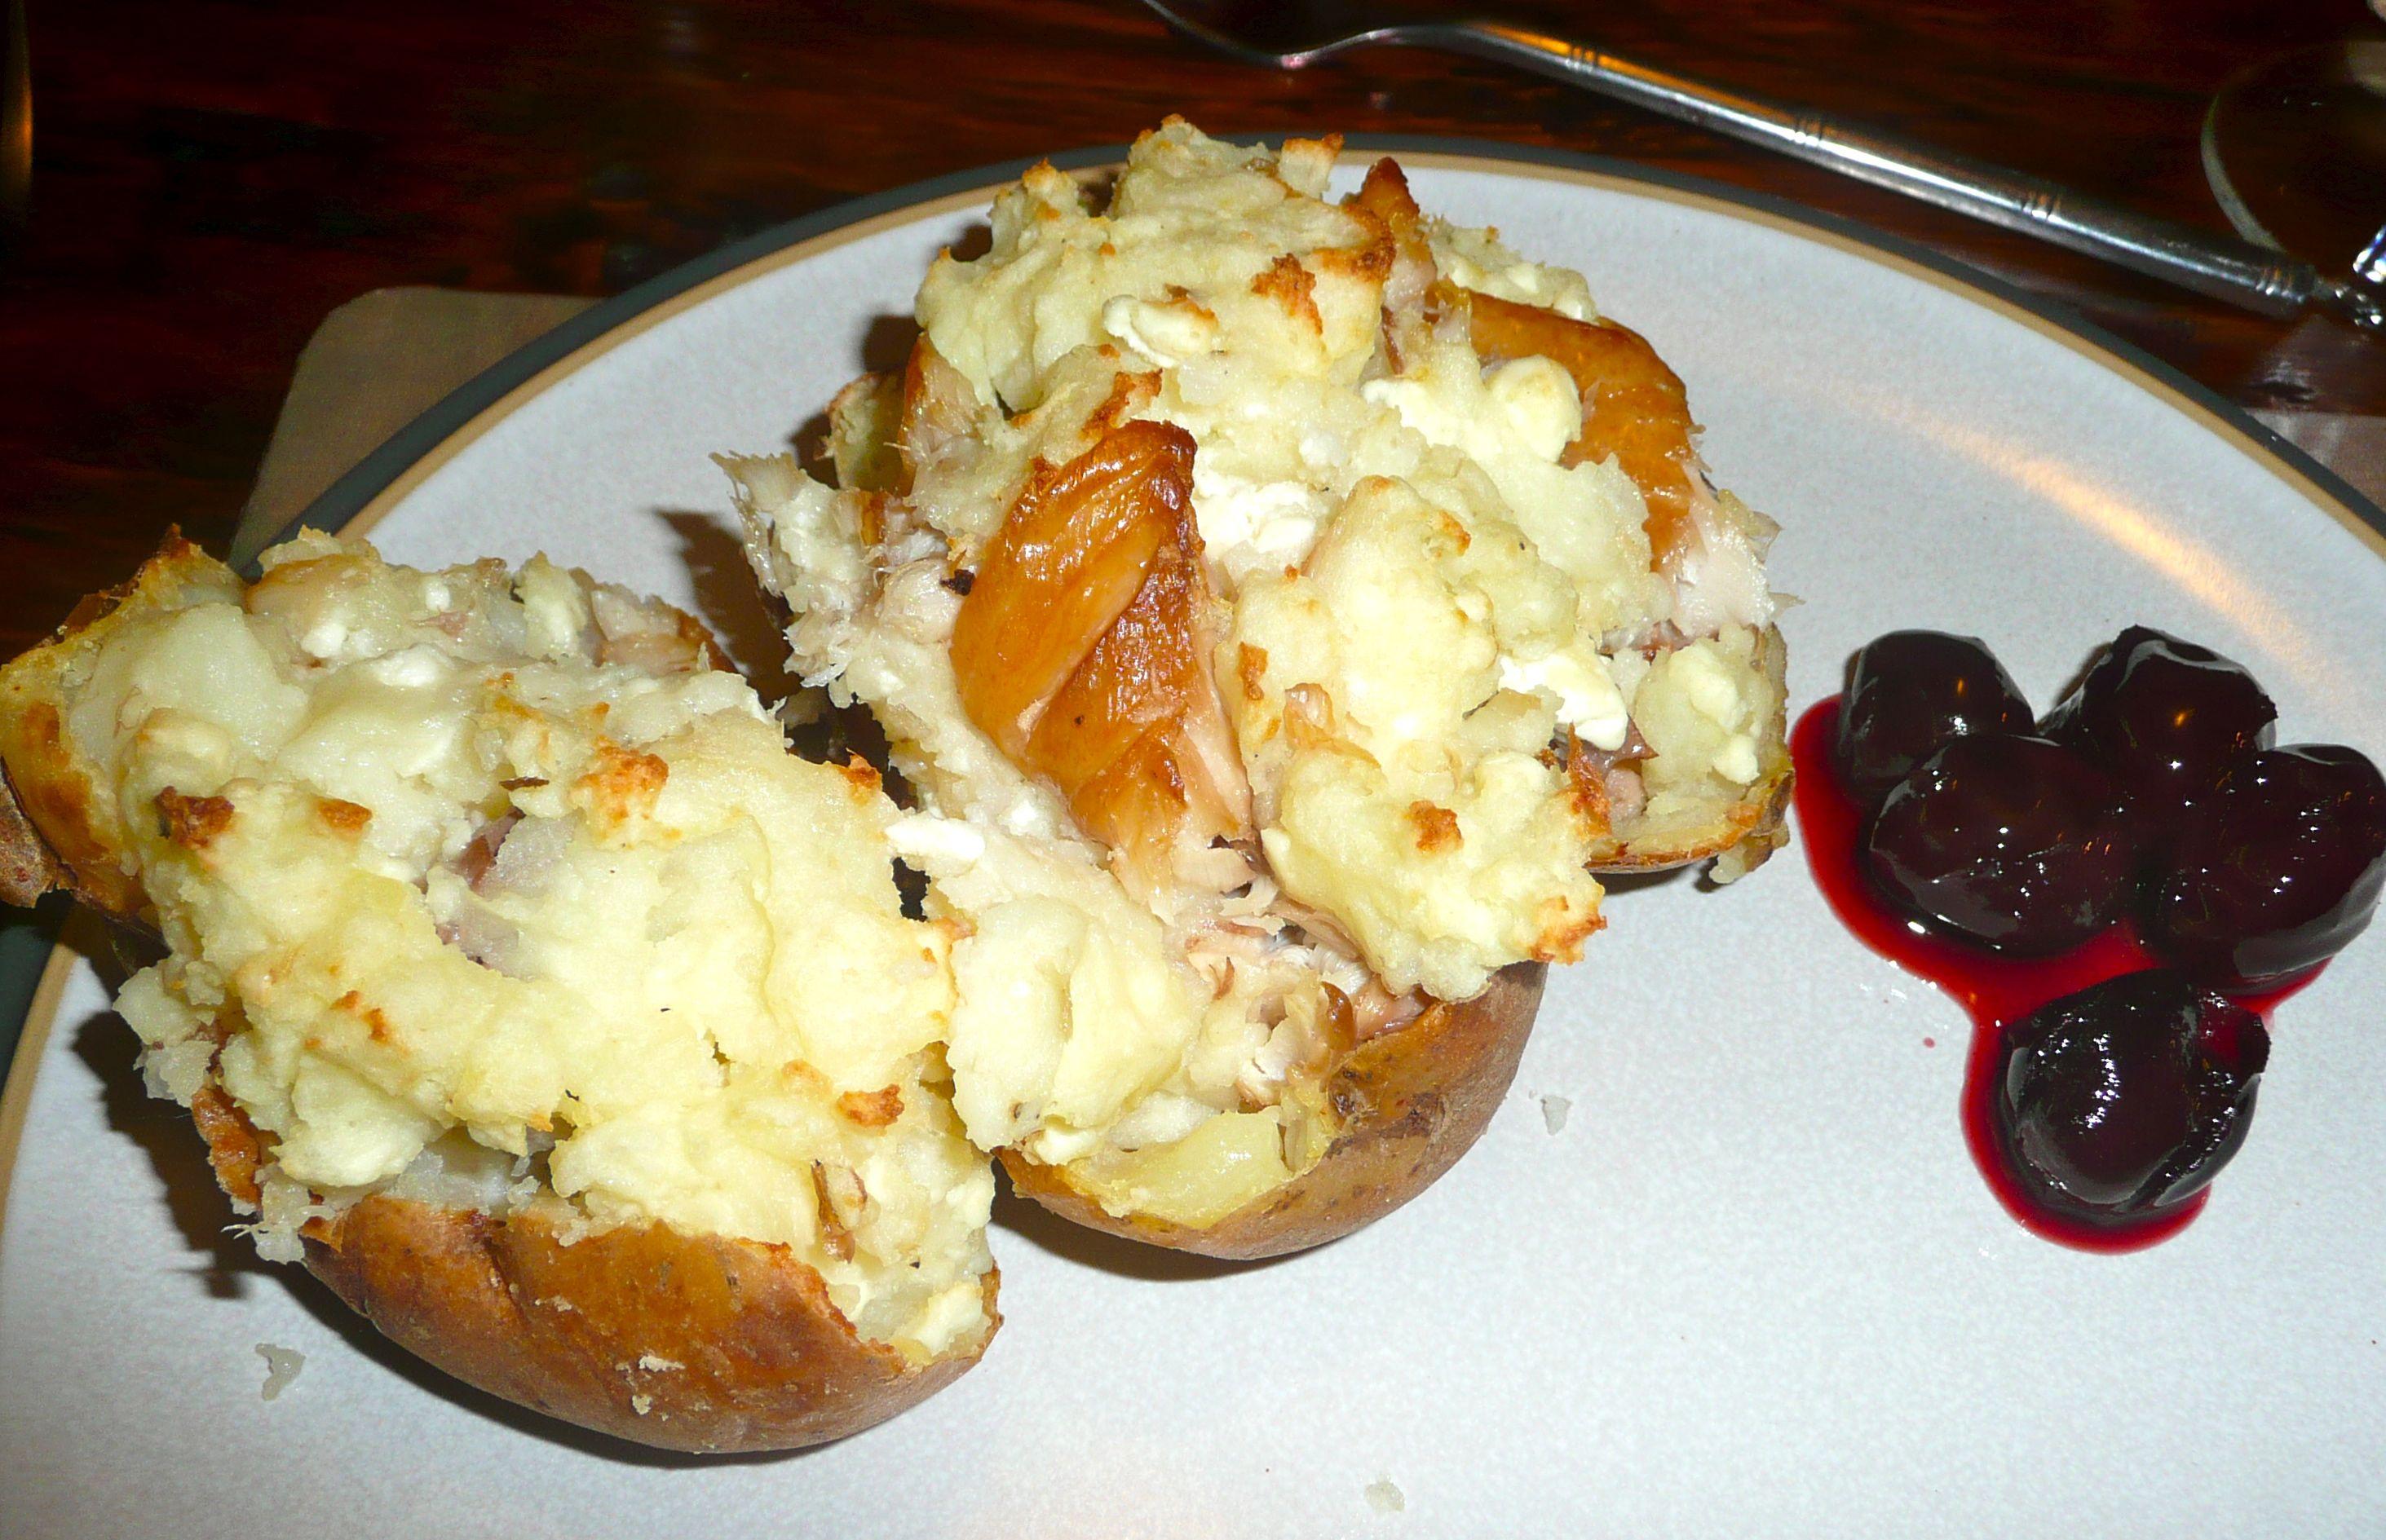 mackerel and feta stuffed potatoes